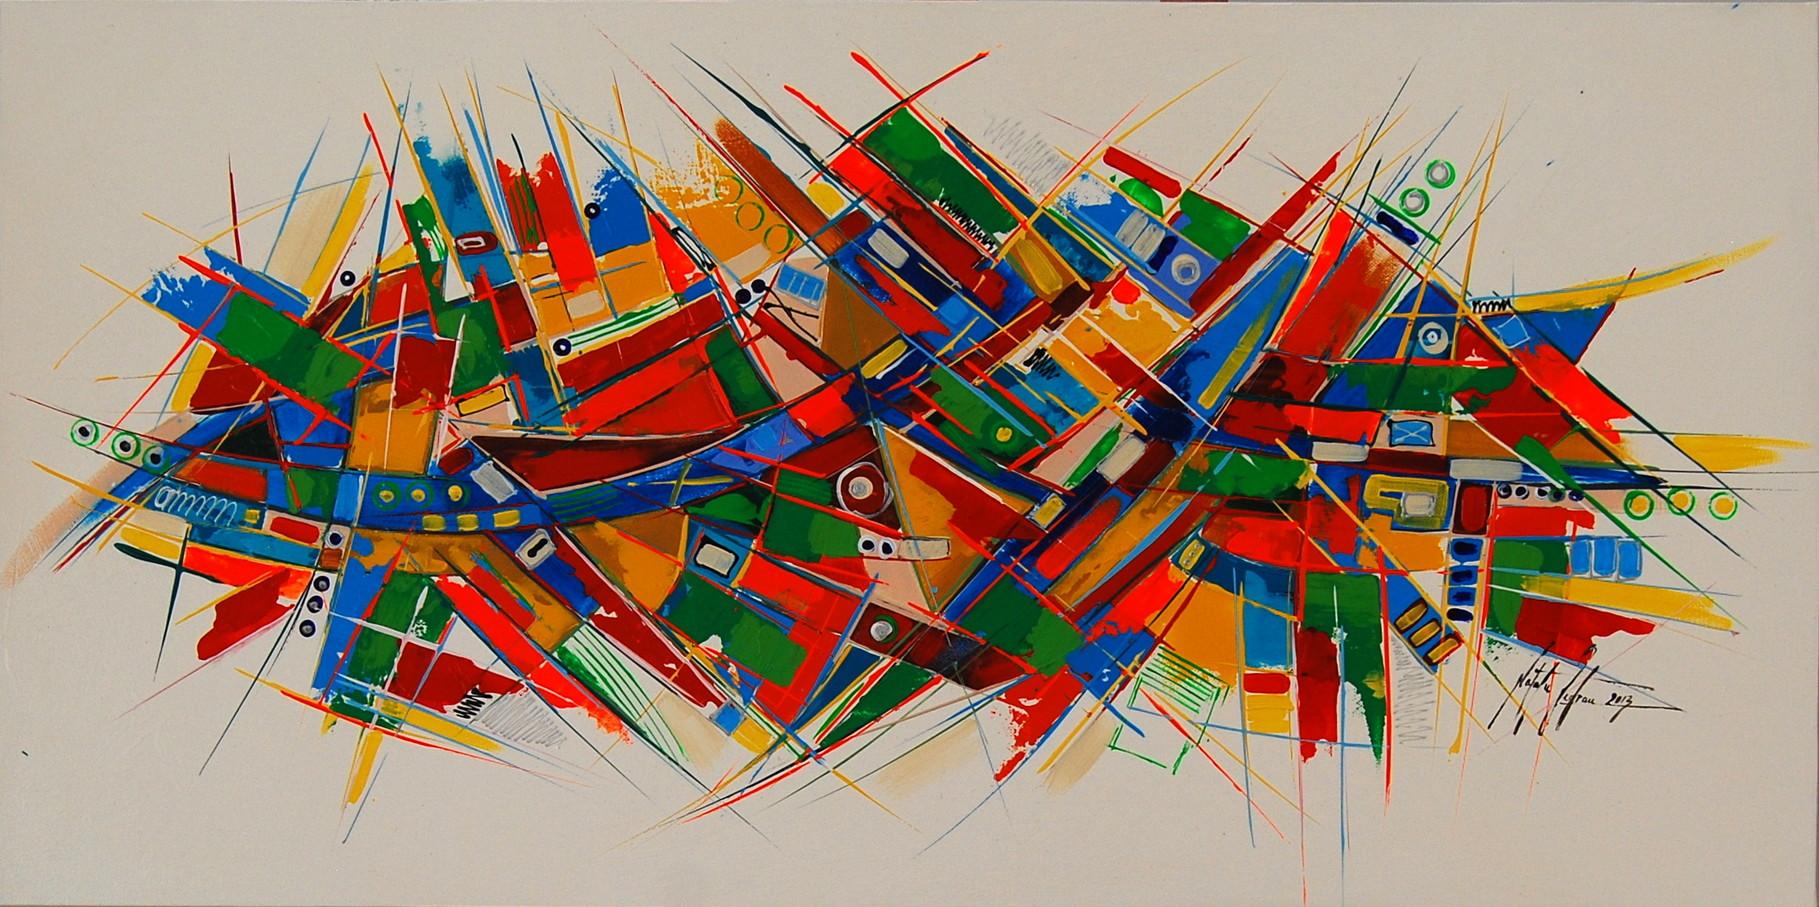 100 x 50 cm Acryl auf Leinwand, Galeriekeilrahmen.